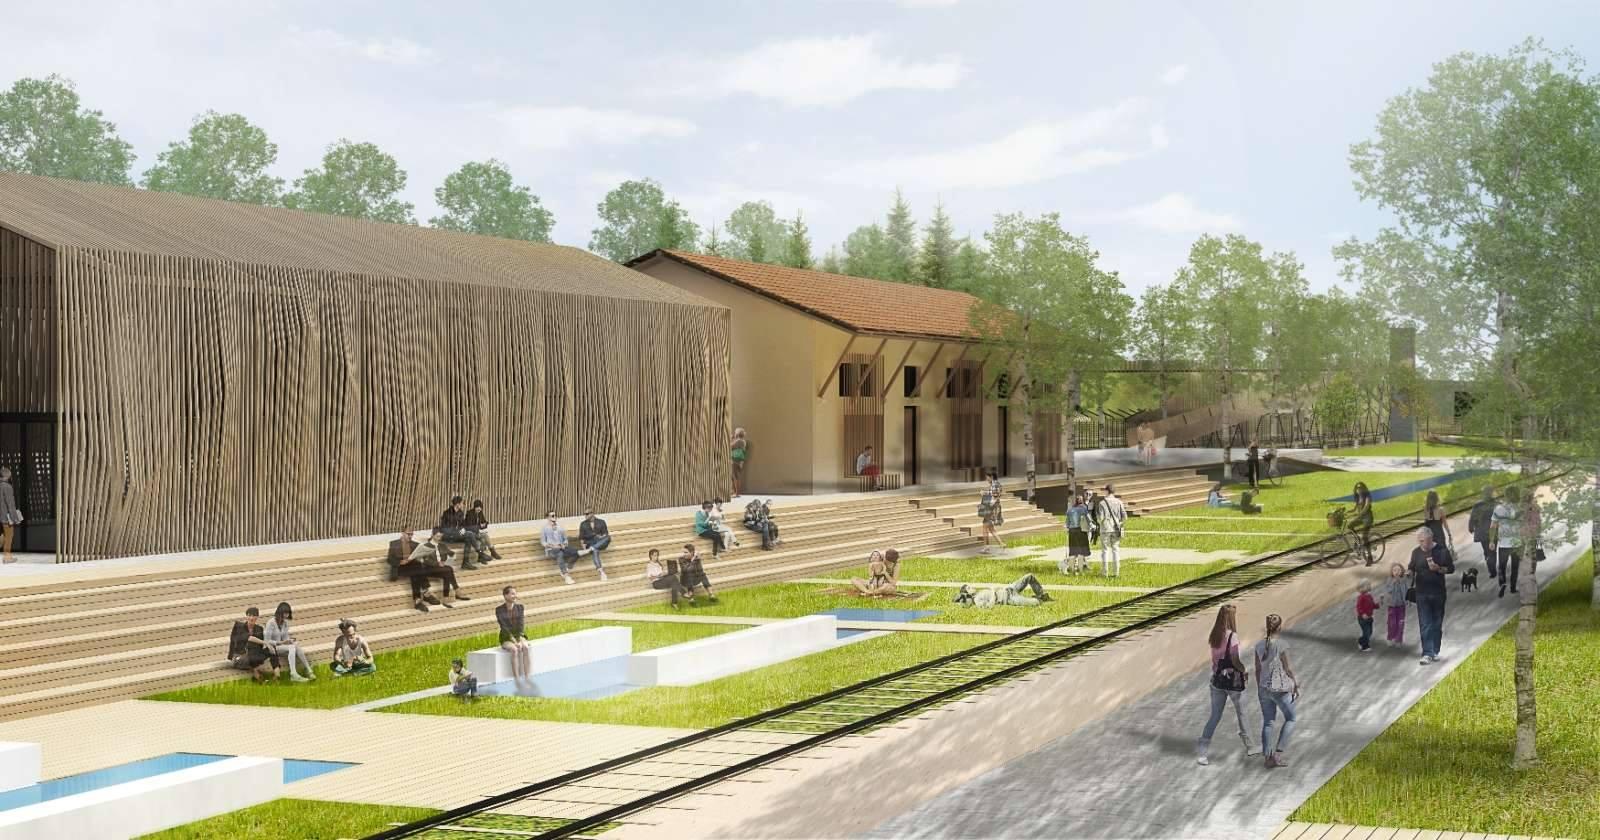 To μέλλον της περιοχής του Σταθμού στην Κοζάνη - Παρουσίαση των αποτελεσμάτων του Πανελλήνιου Αρχιτεκτονικού Διαγωνισμού Ιδεών